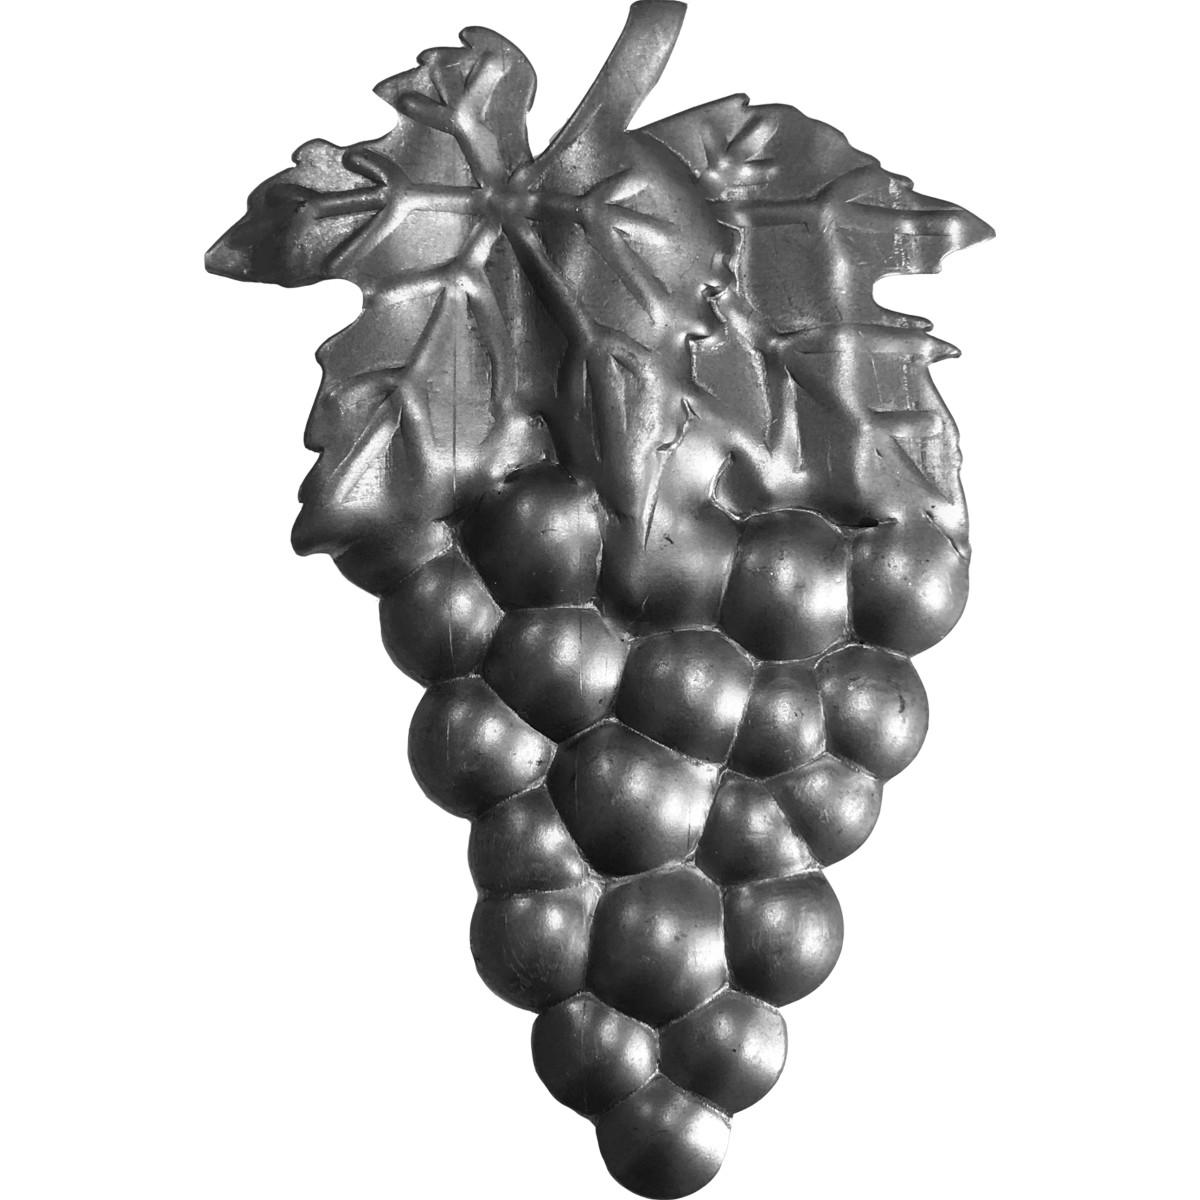 Элемент кованый штамповка Виноград правый